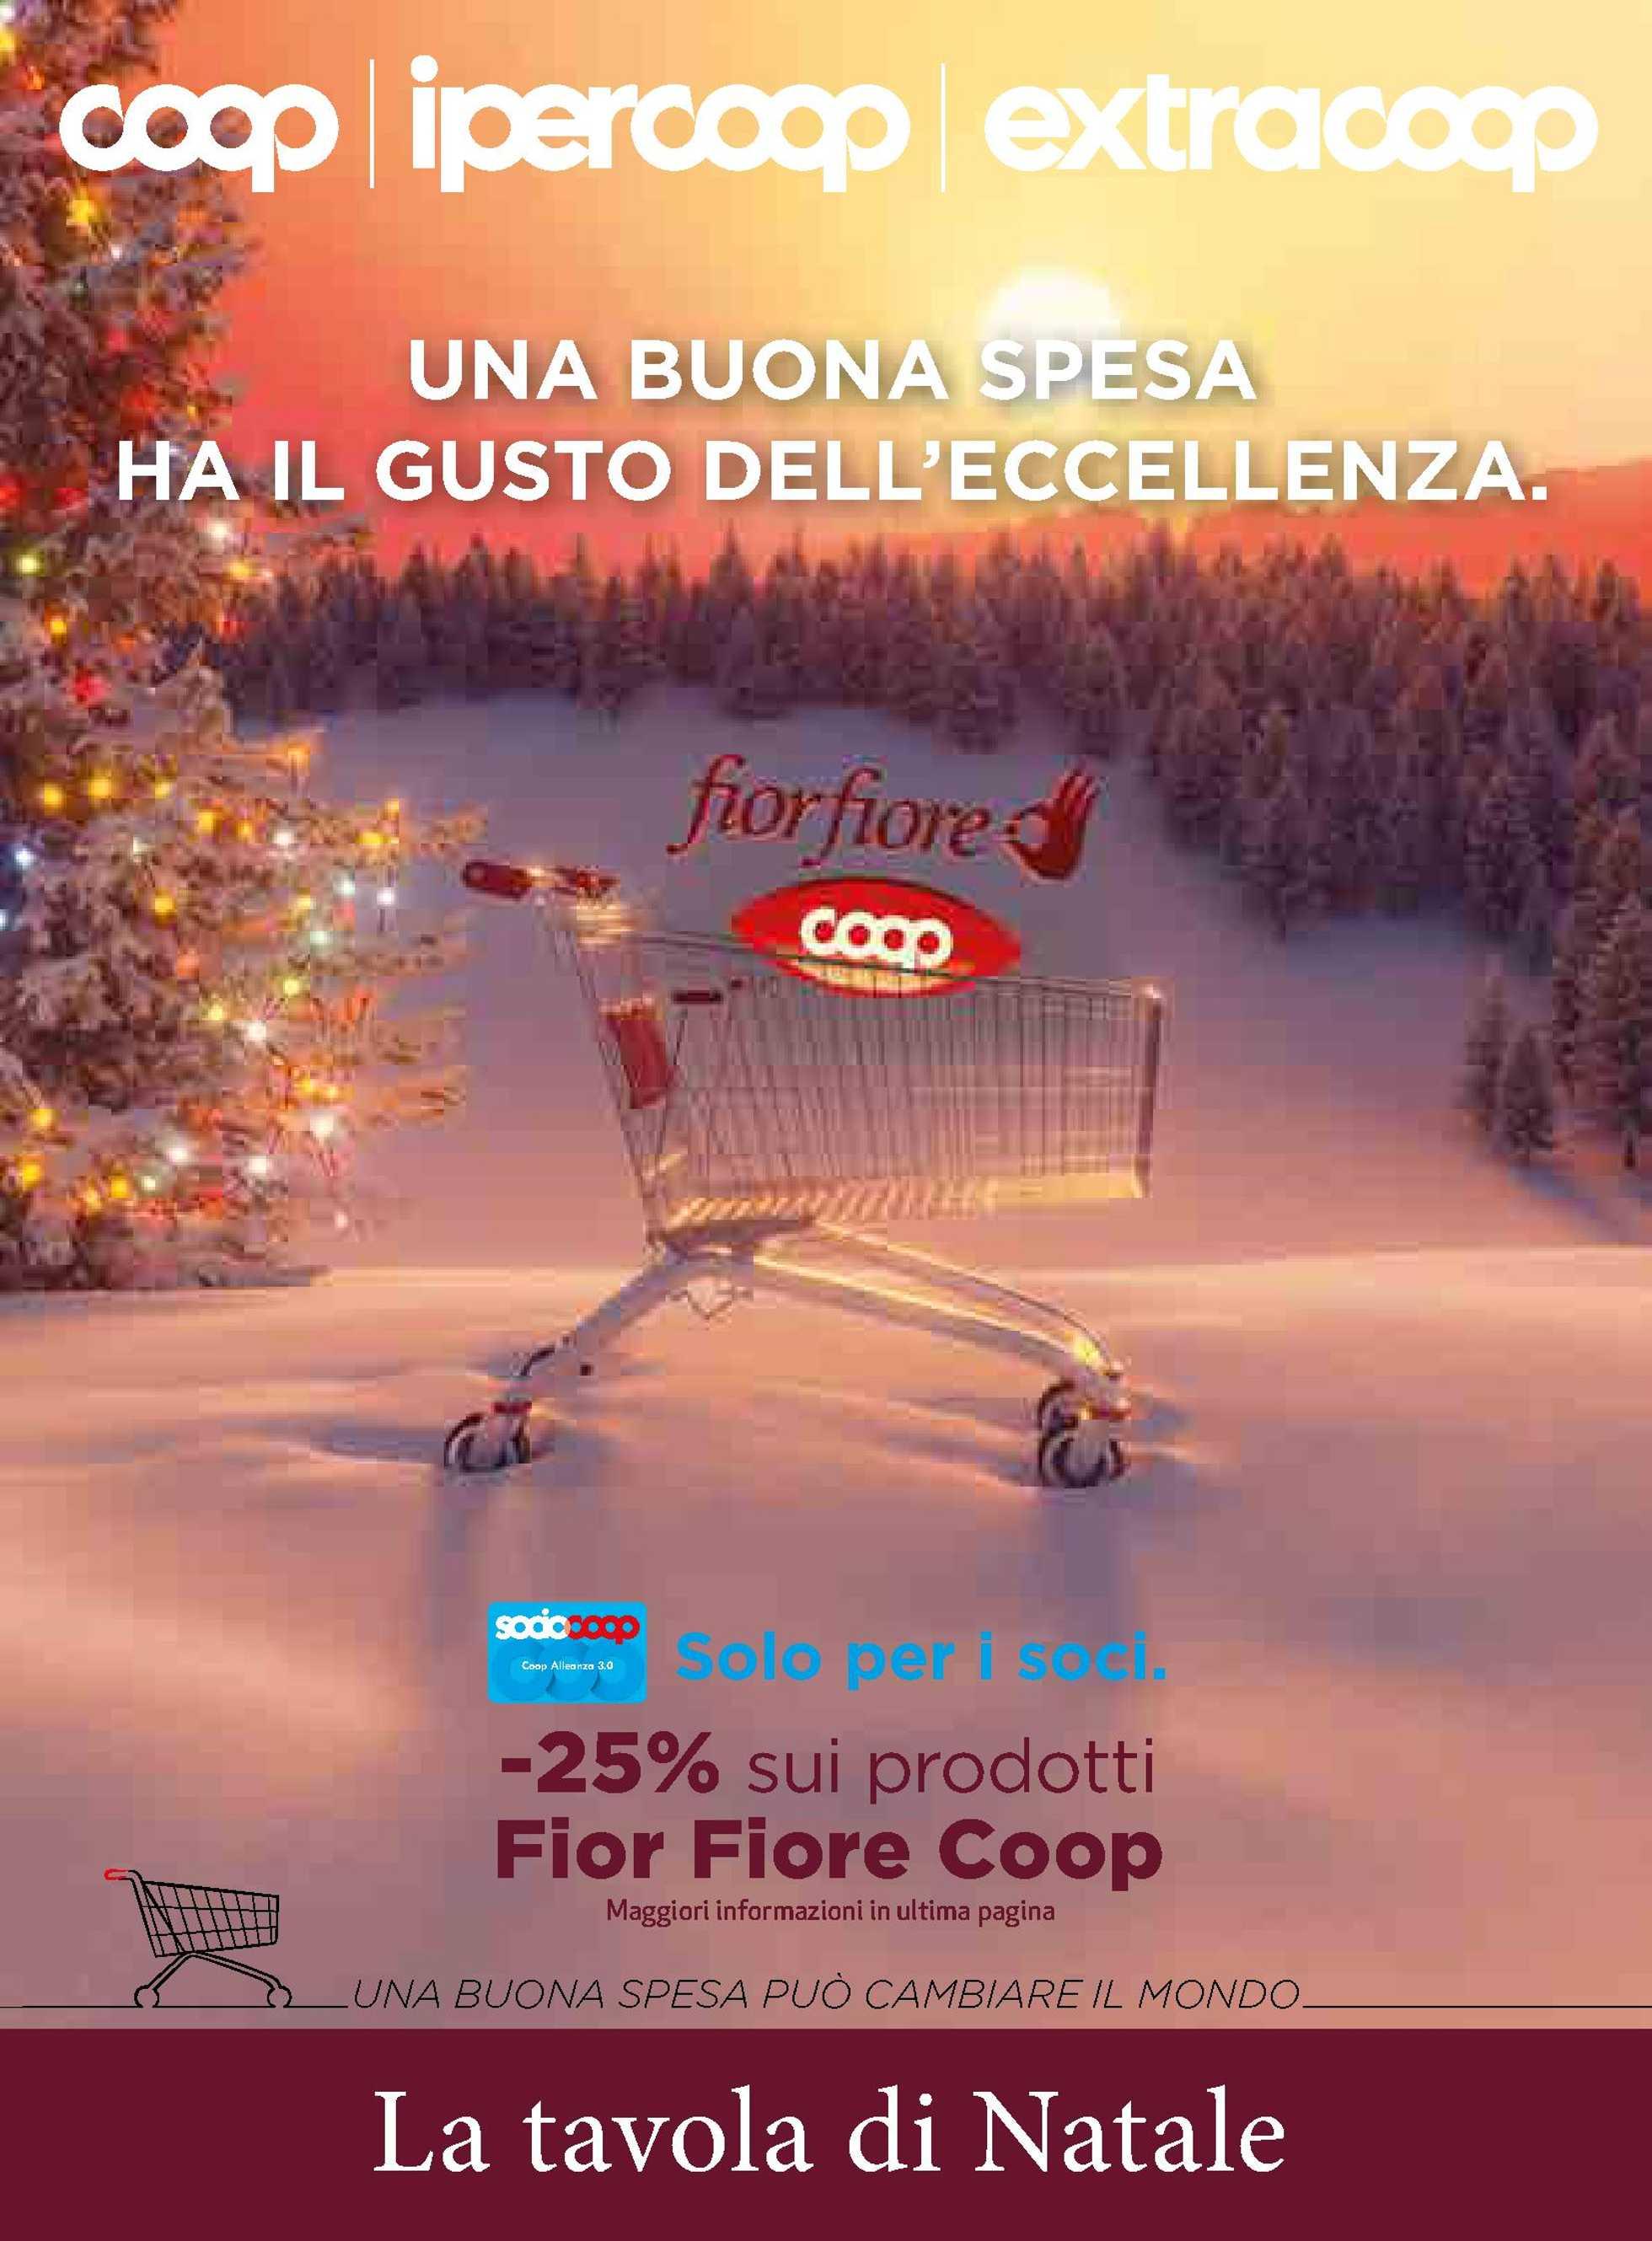 Ipercoop (Coop Alleanza) - offerte valide dal 24.11.2020 al 31.12.2020 - pagina 1.